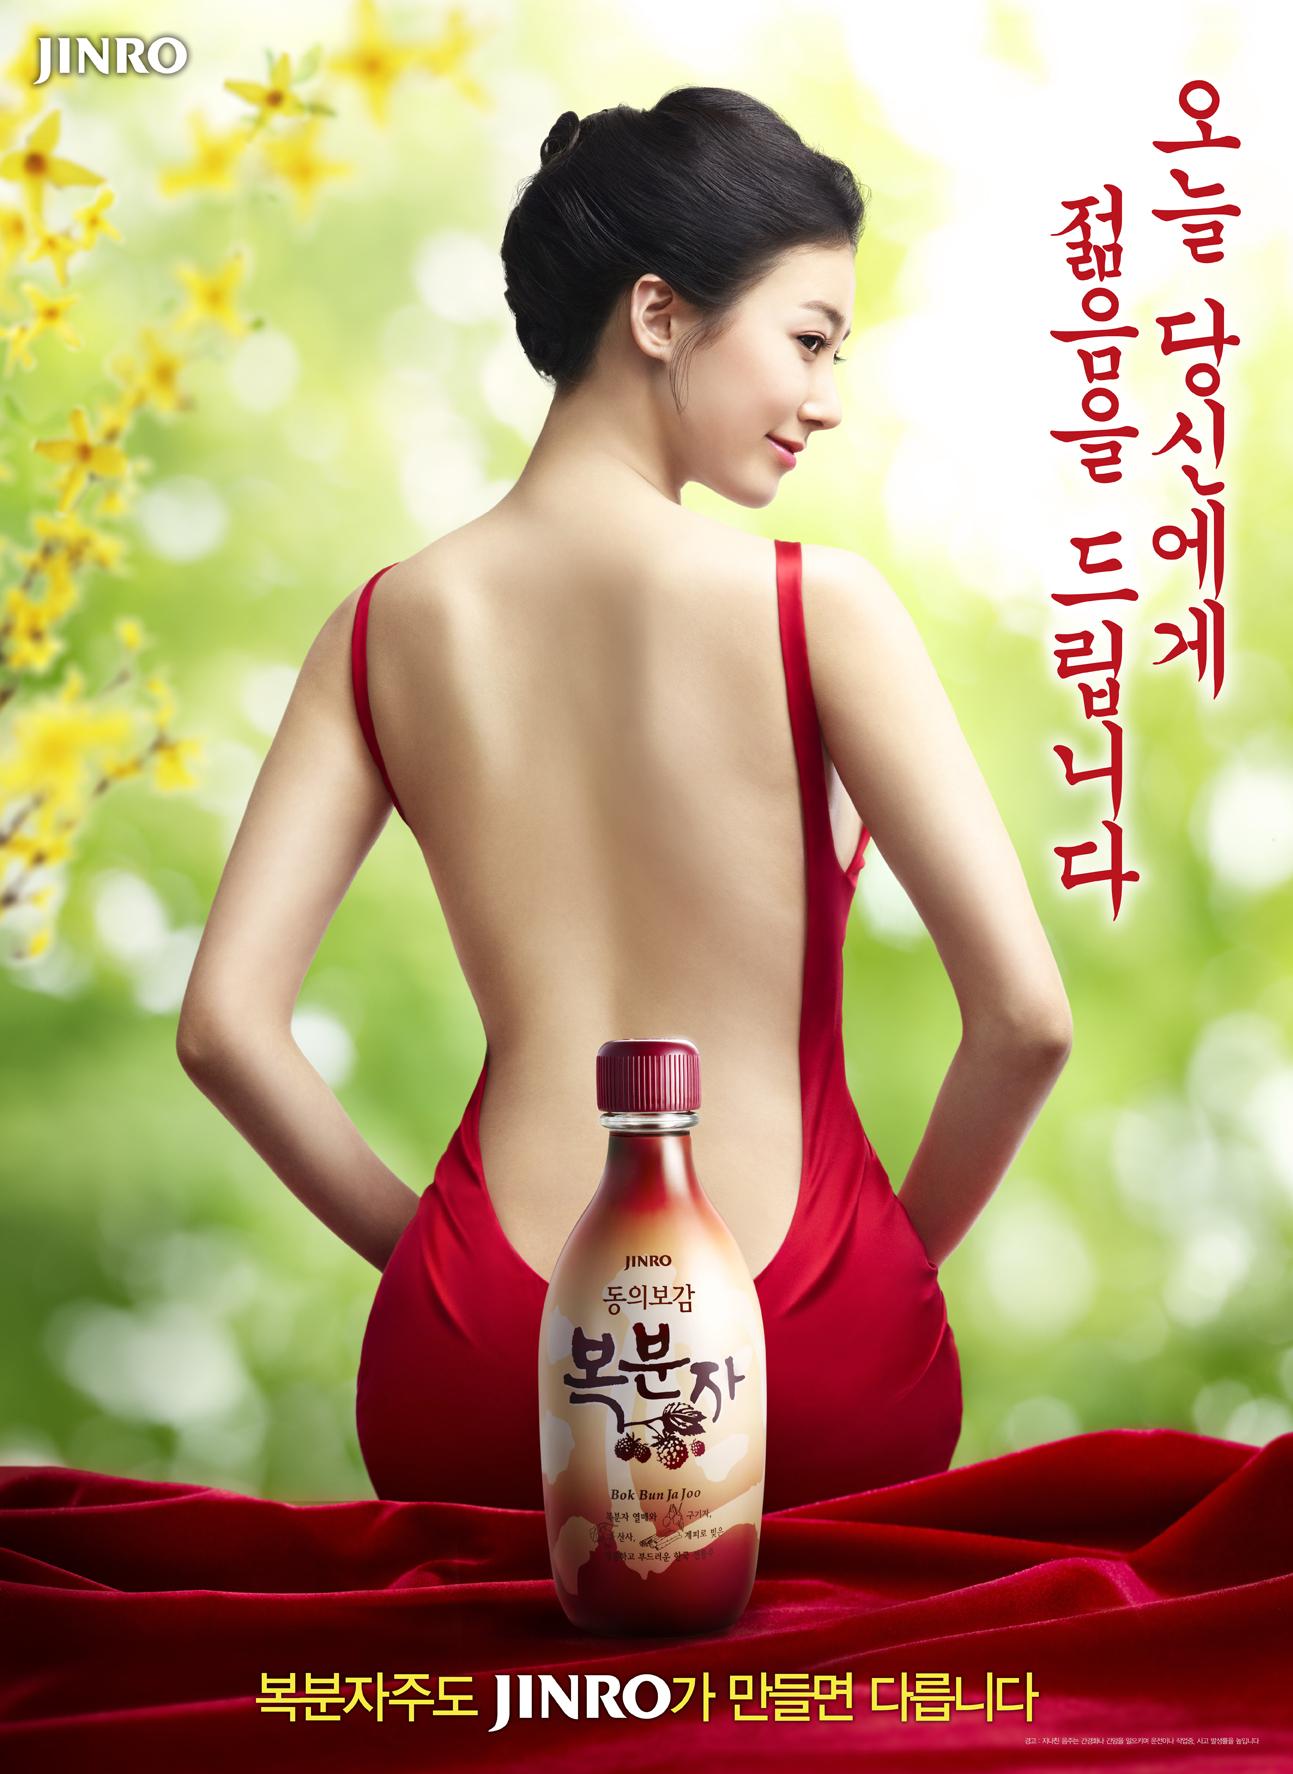 Phallic Bokbunja advertisement